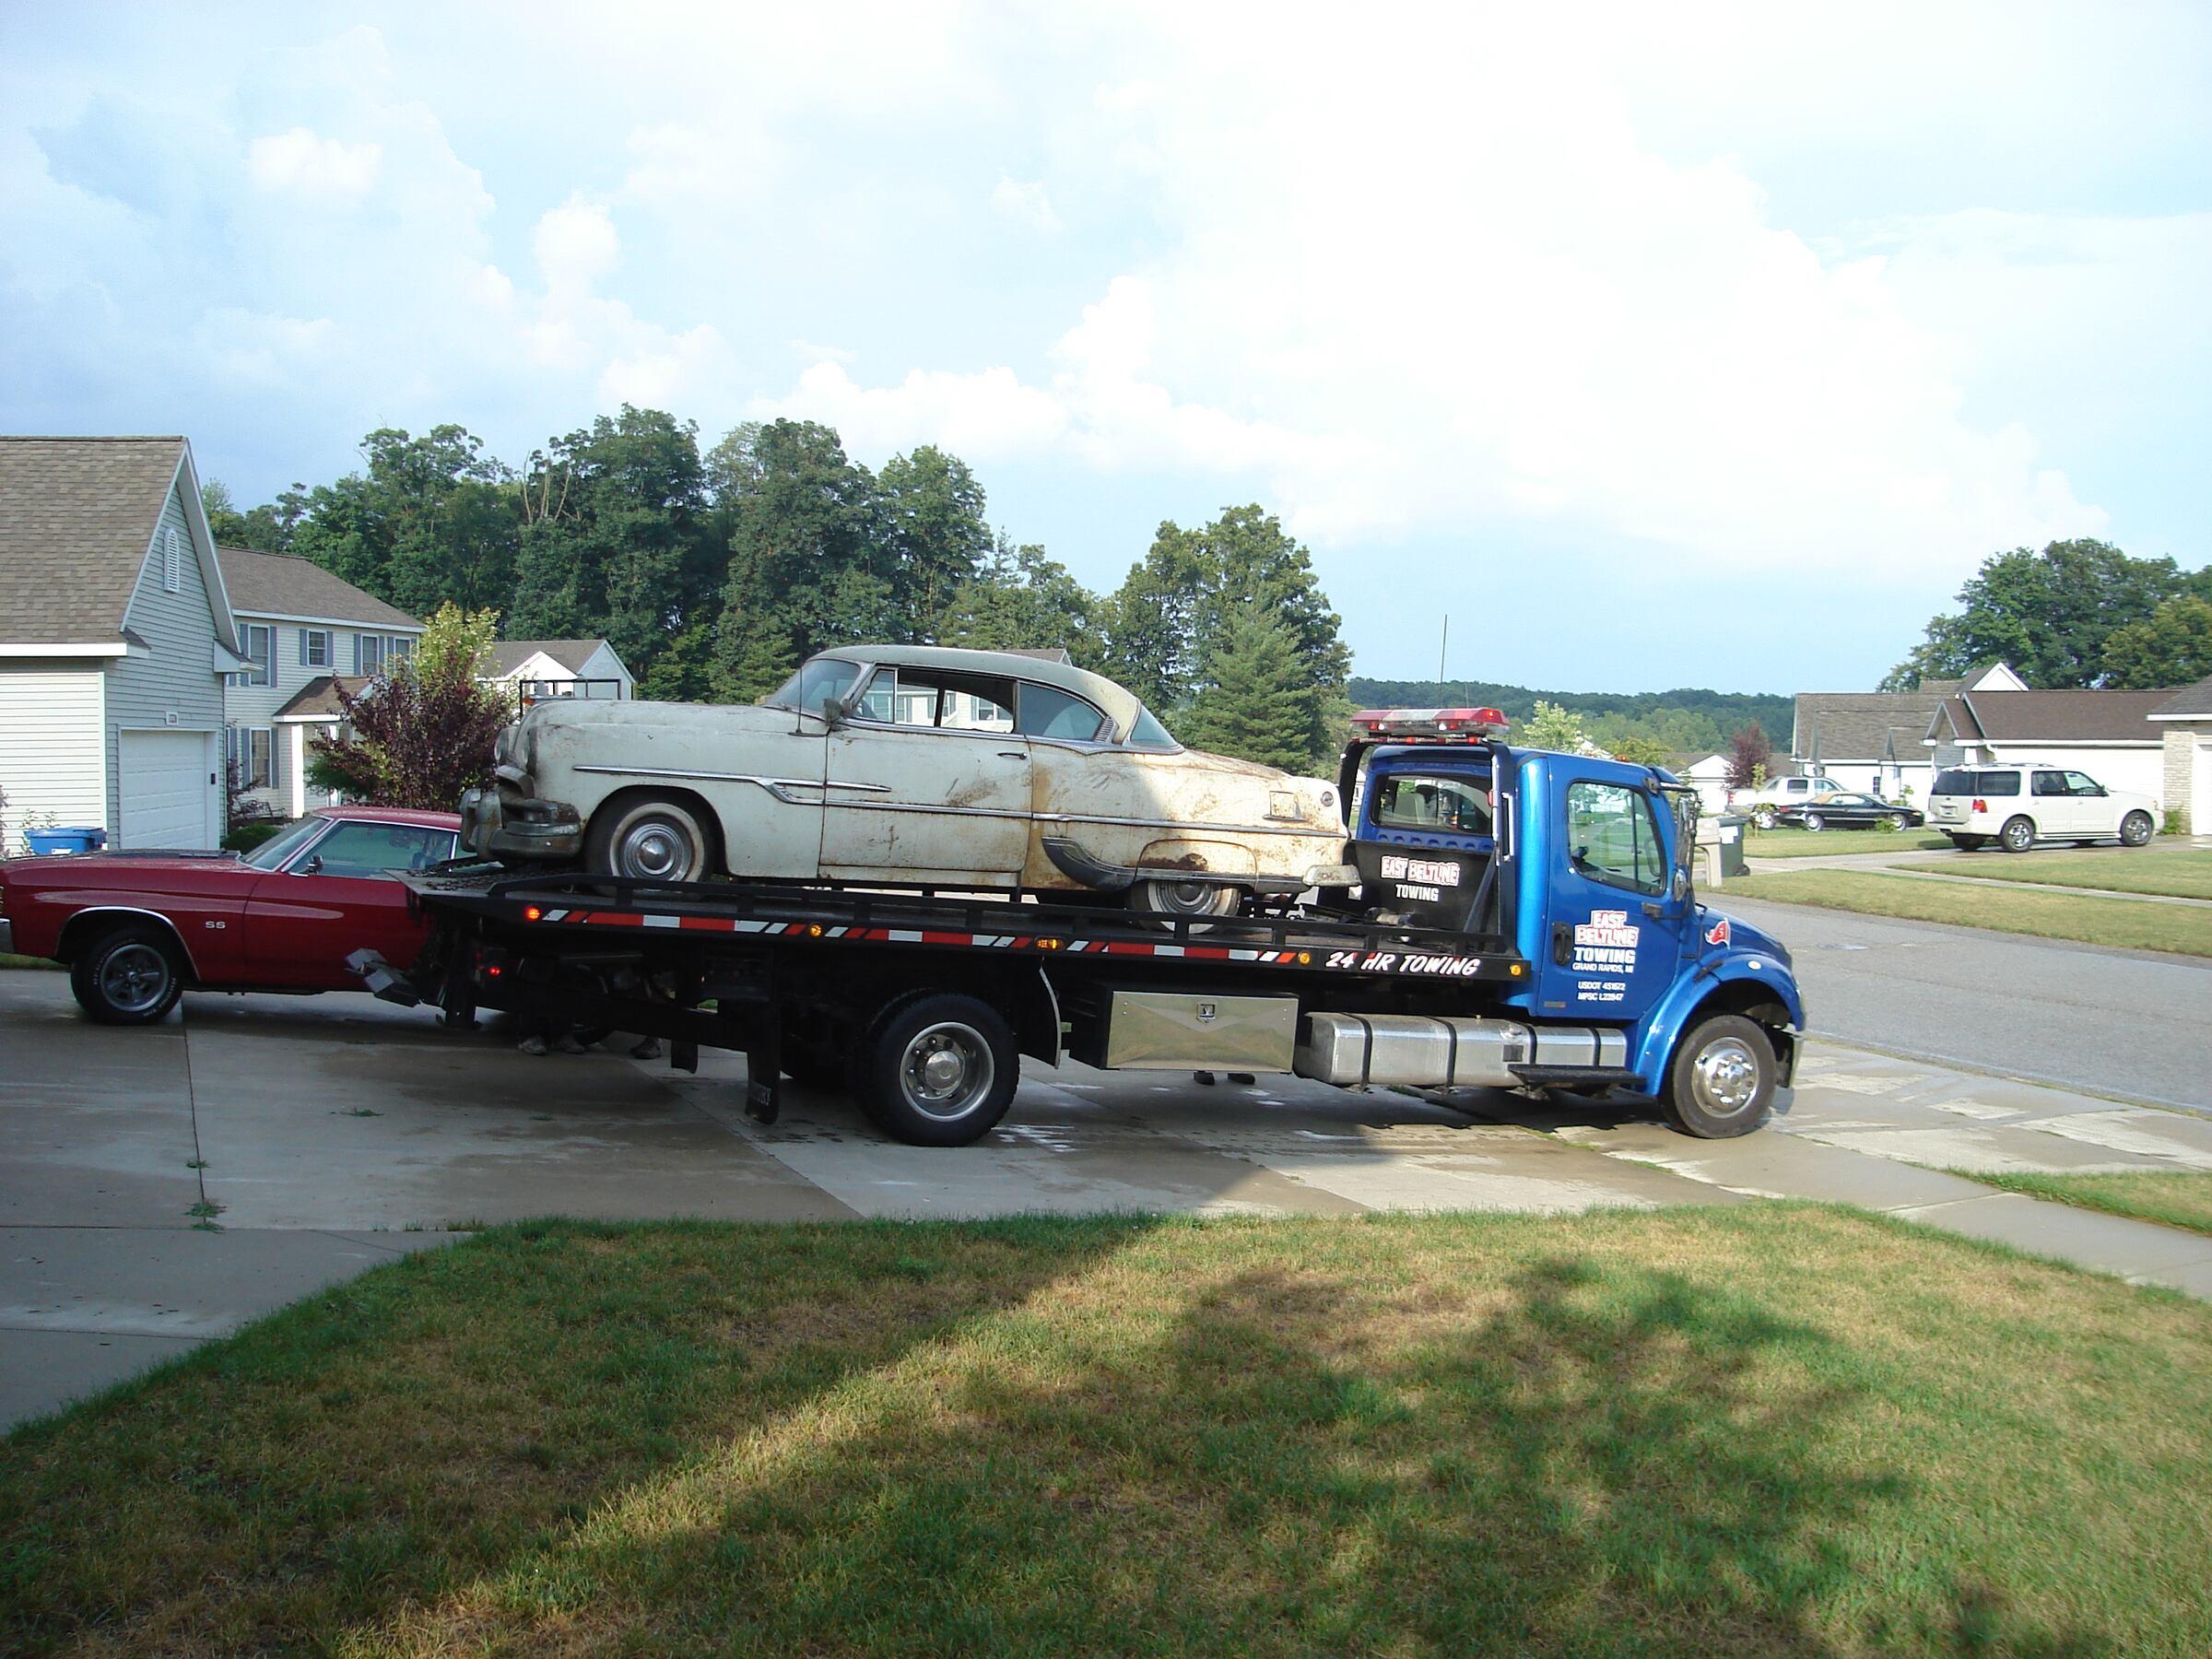 1953 - Pontiac, Cheiftan Deluxe